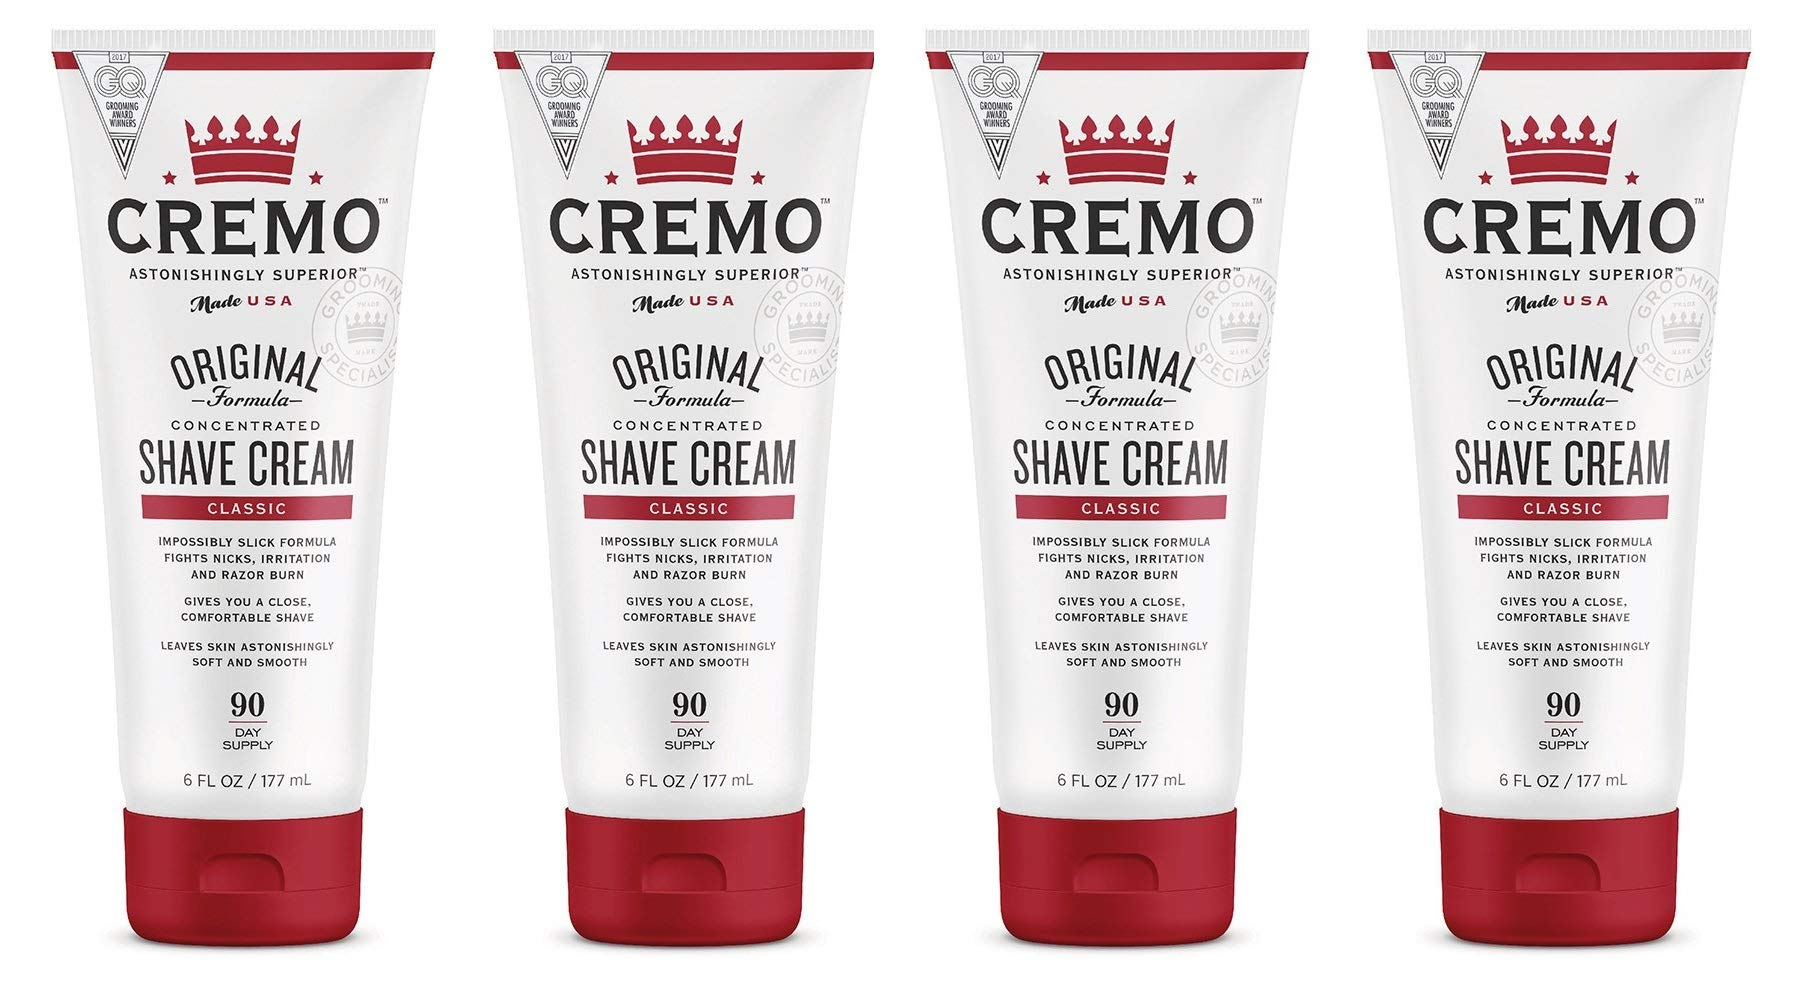 Original Shave Cream, Astonishingly Superior Smooth Shaving Cream Fights Nicks, Cuts and Razor Burn, 6 FL oz, (4 Count, Original)